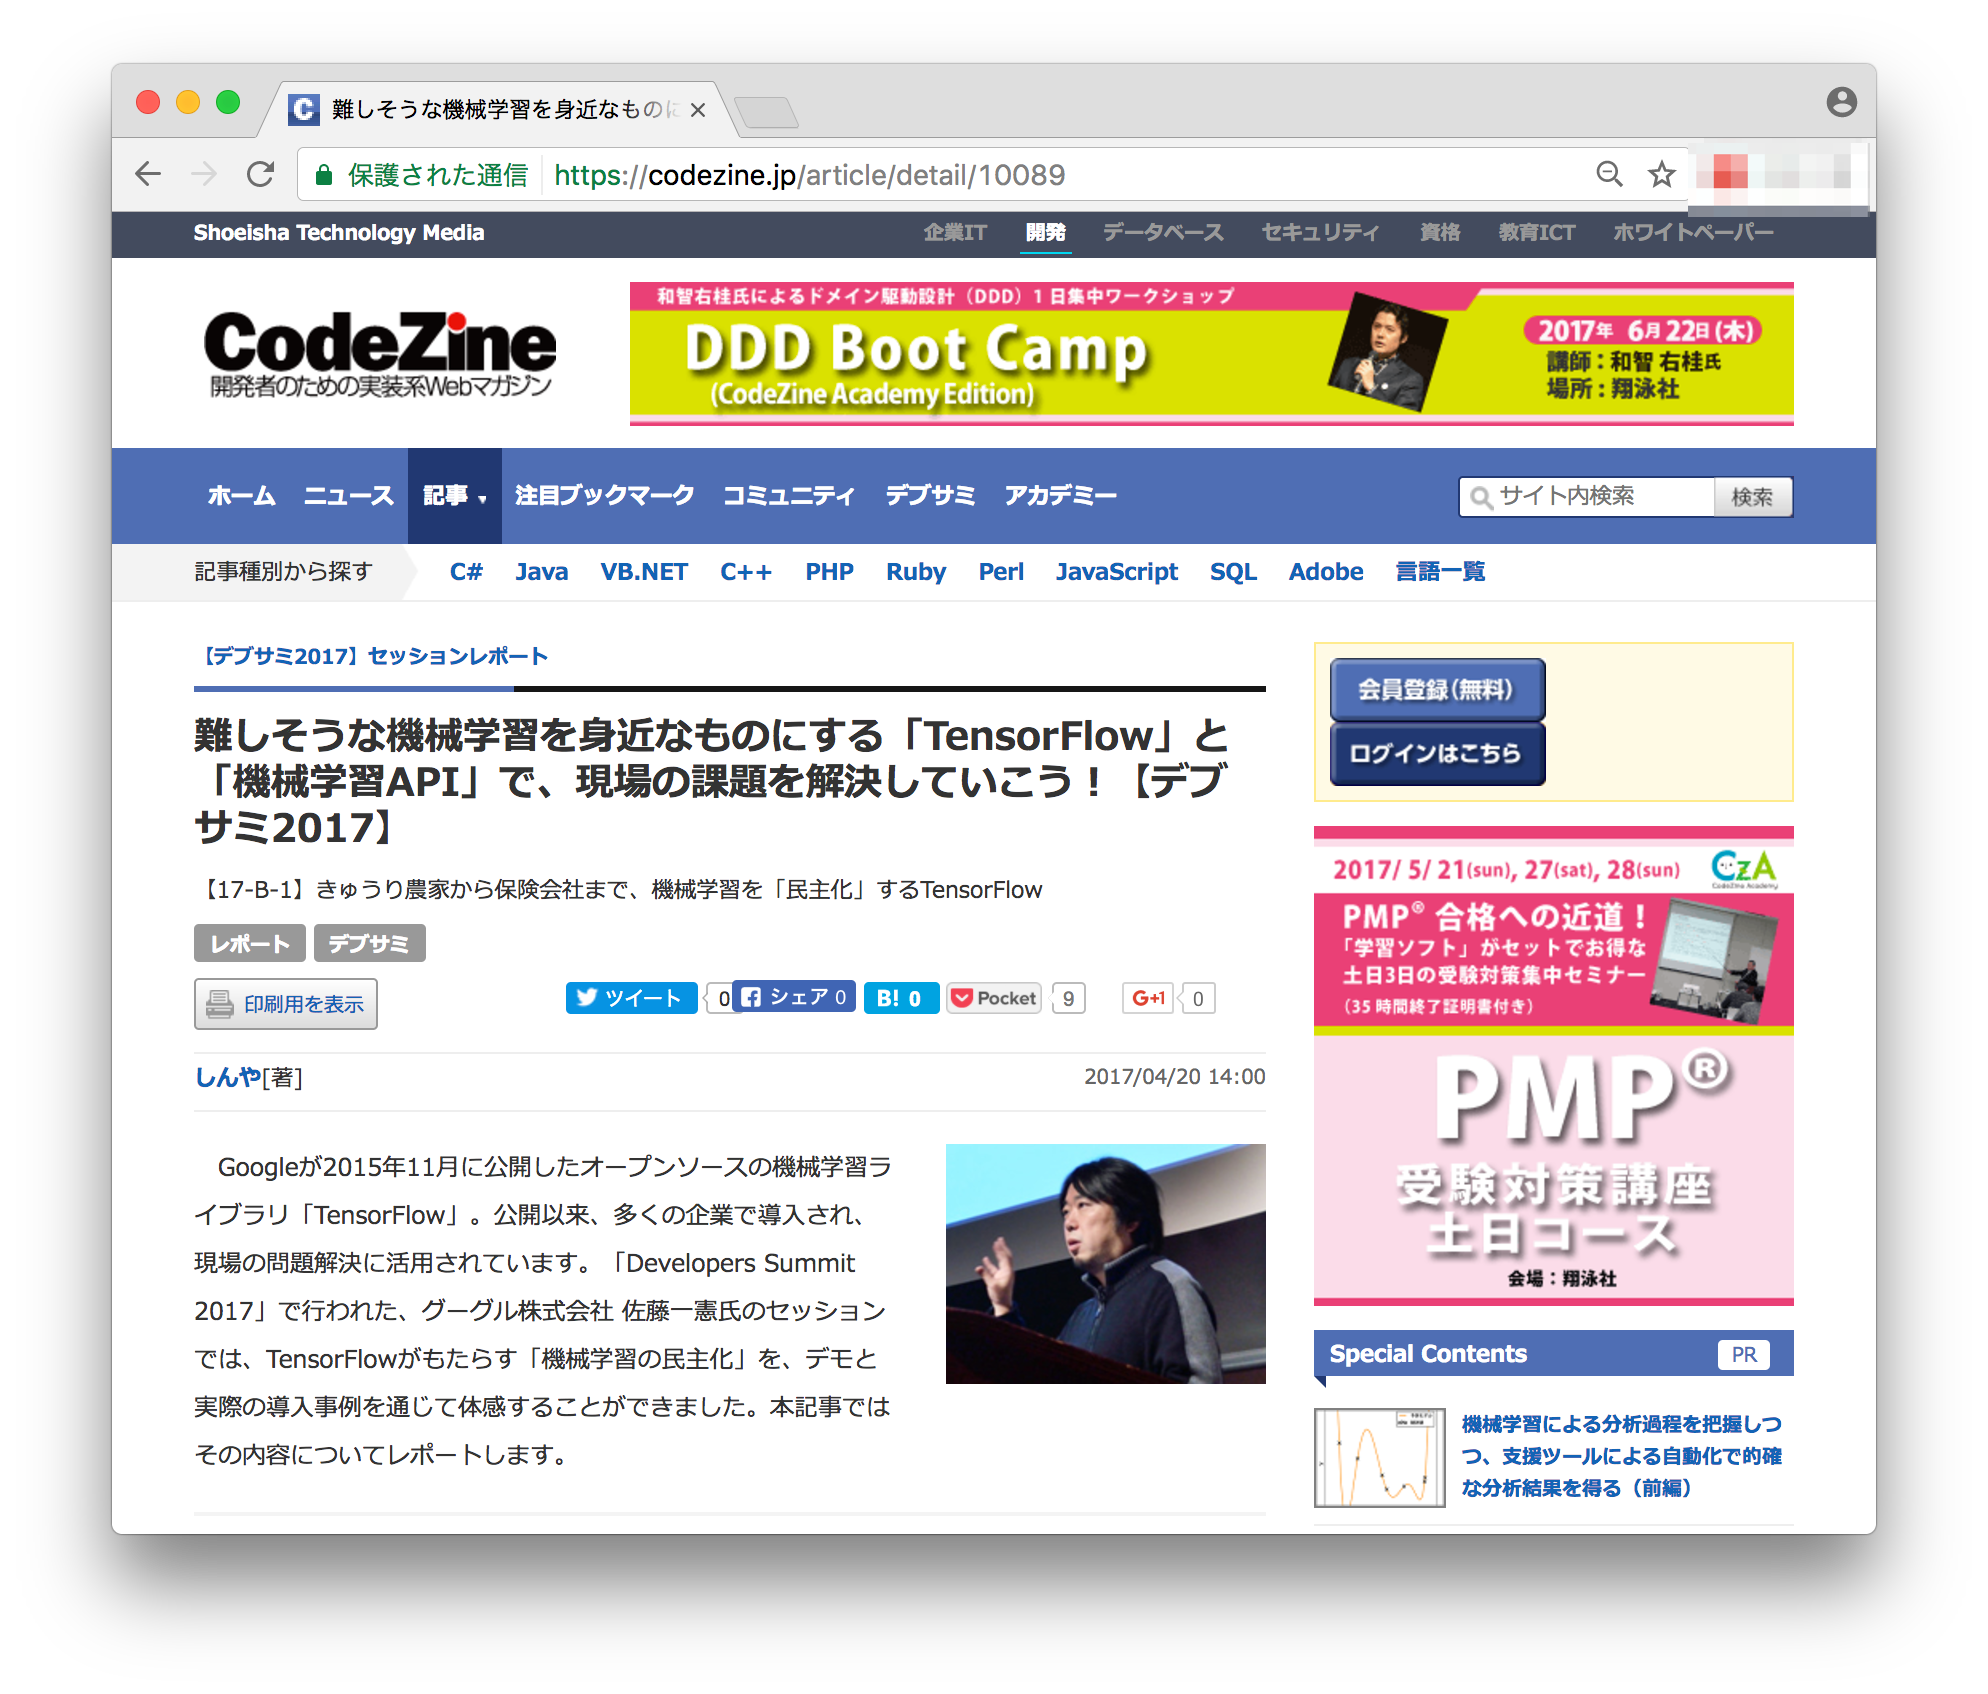 screenshot_2017-04-20_14_21_40